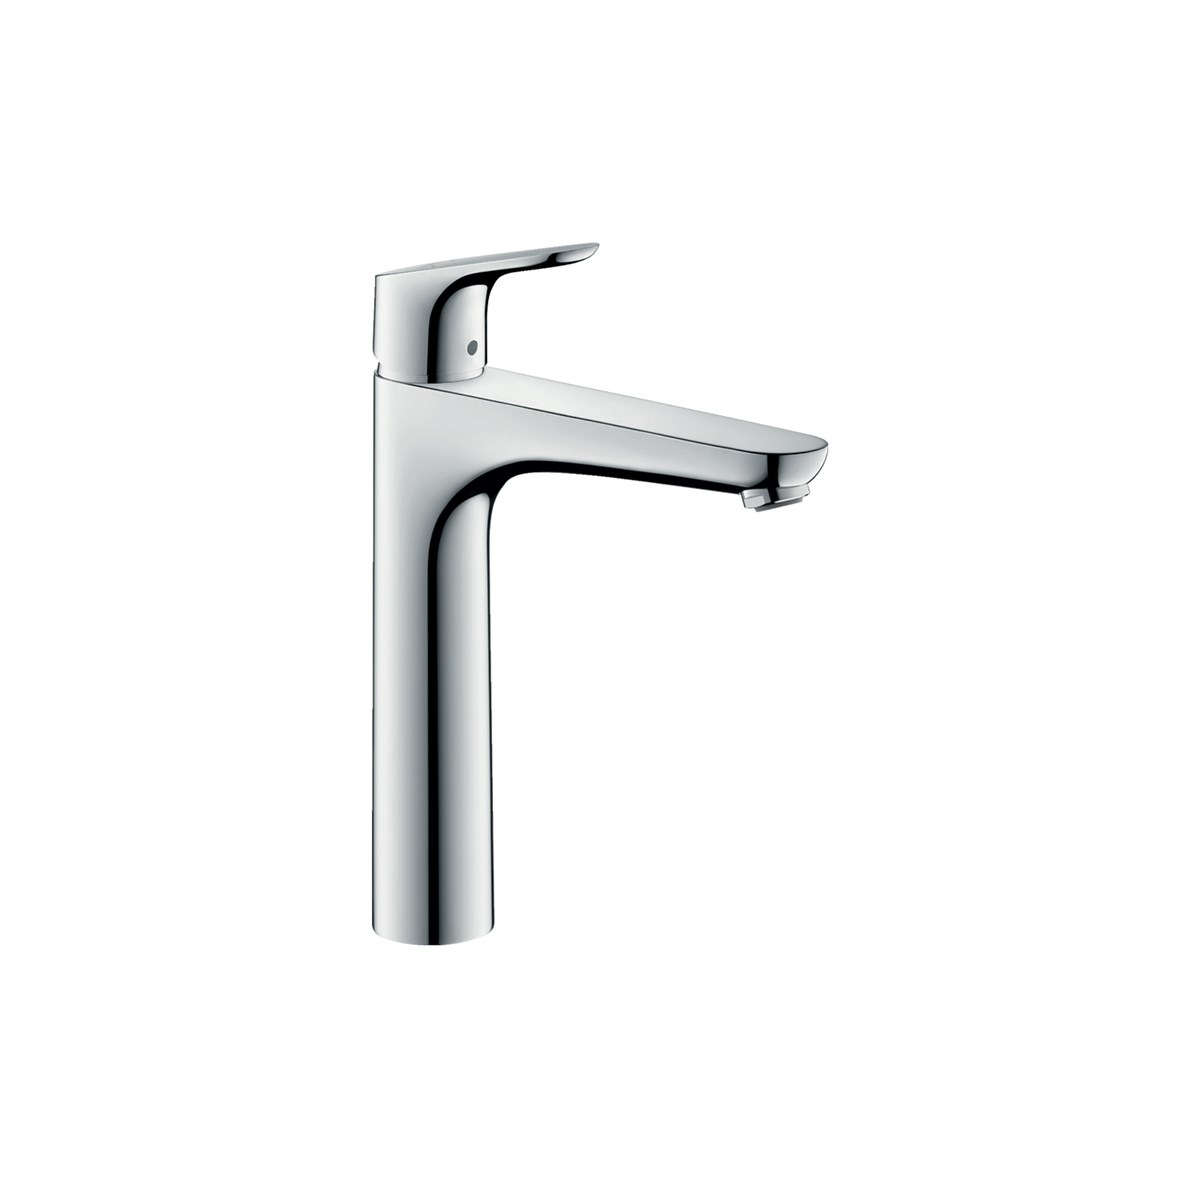 Hansgrohe-Focus-Extended-Basin-Mixer-190-31518000-Matisse-1